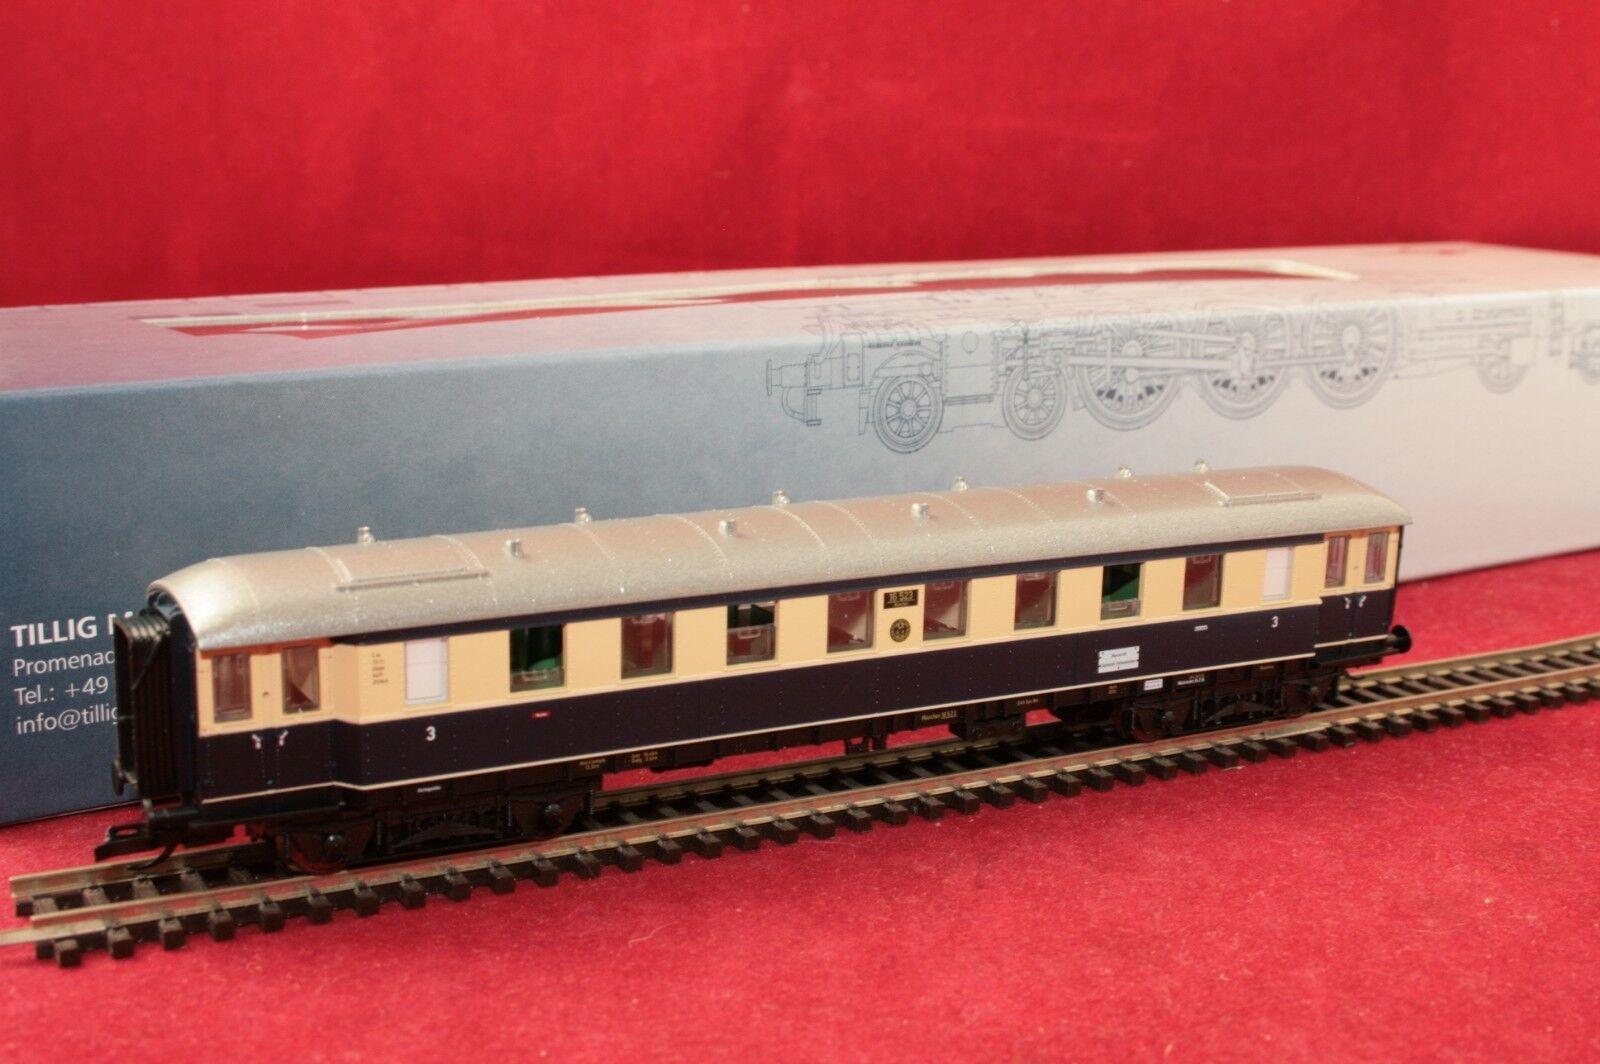 Tillig traccia TT 01757-2 DRG viaggiatori 3. classe  Karwendel-Express  EP. II/Nuovo